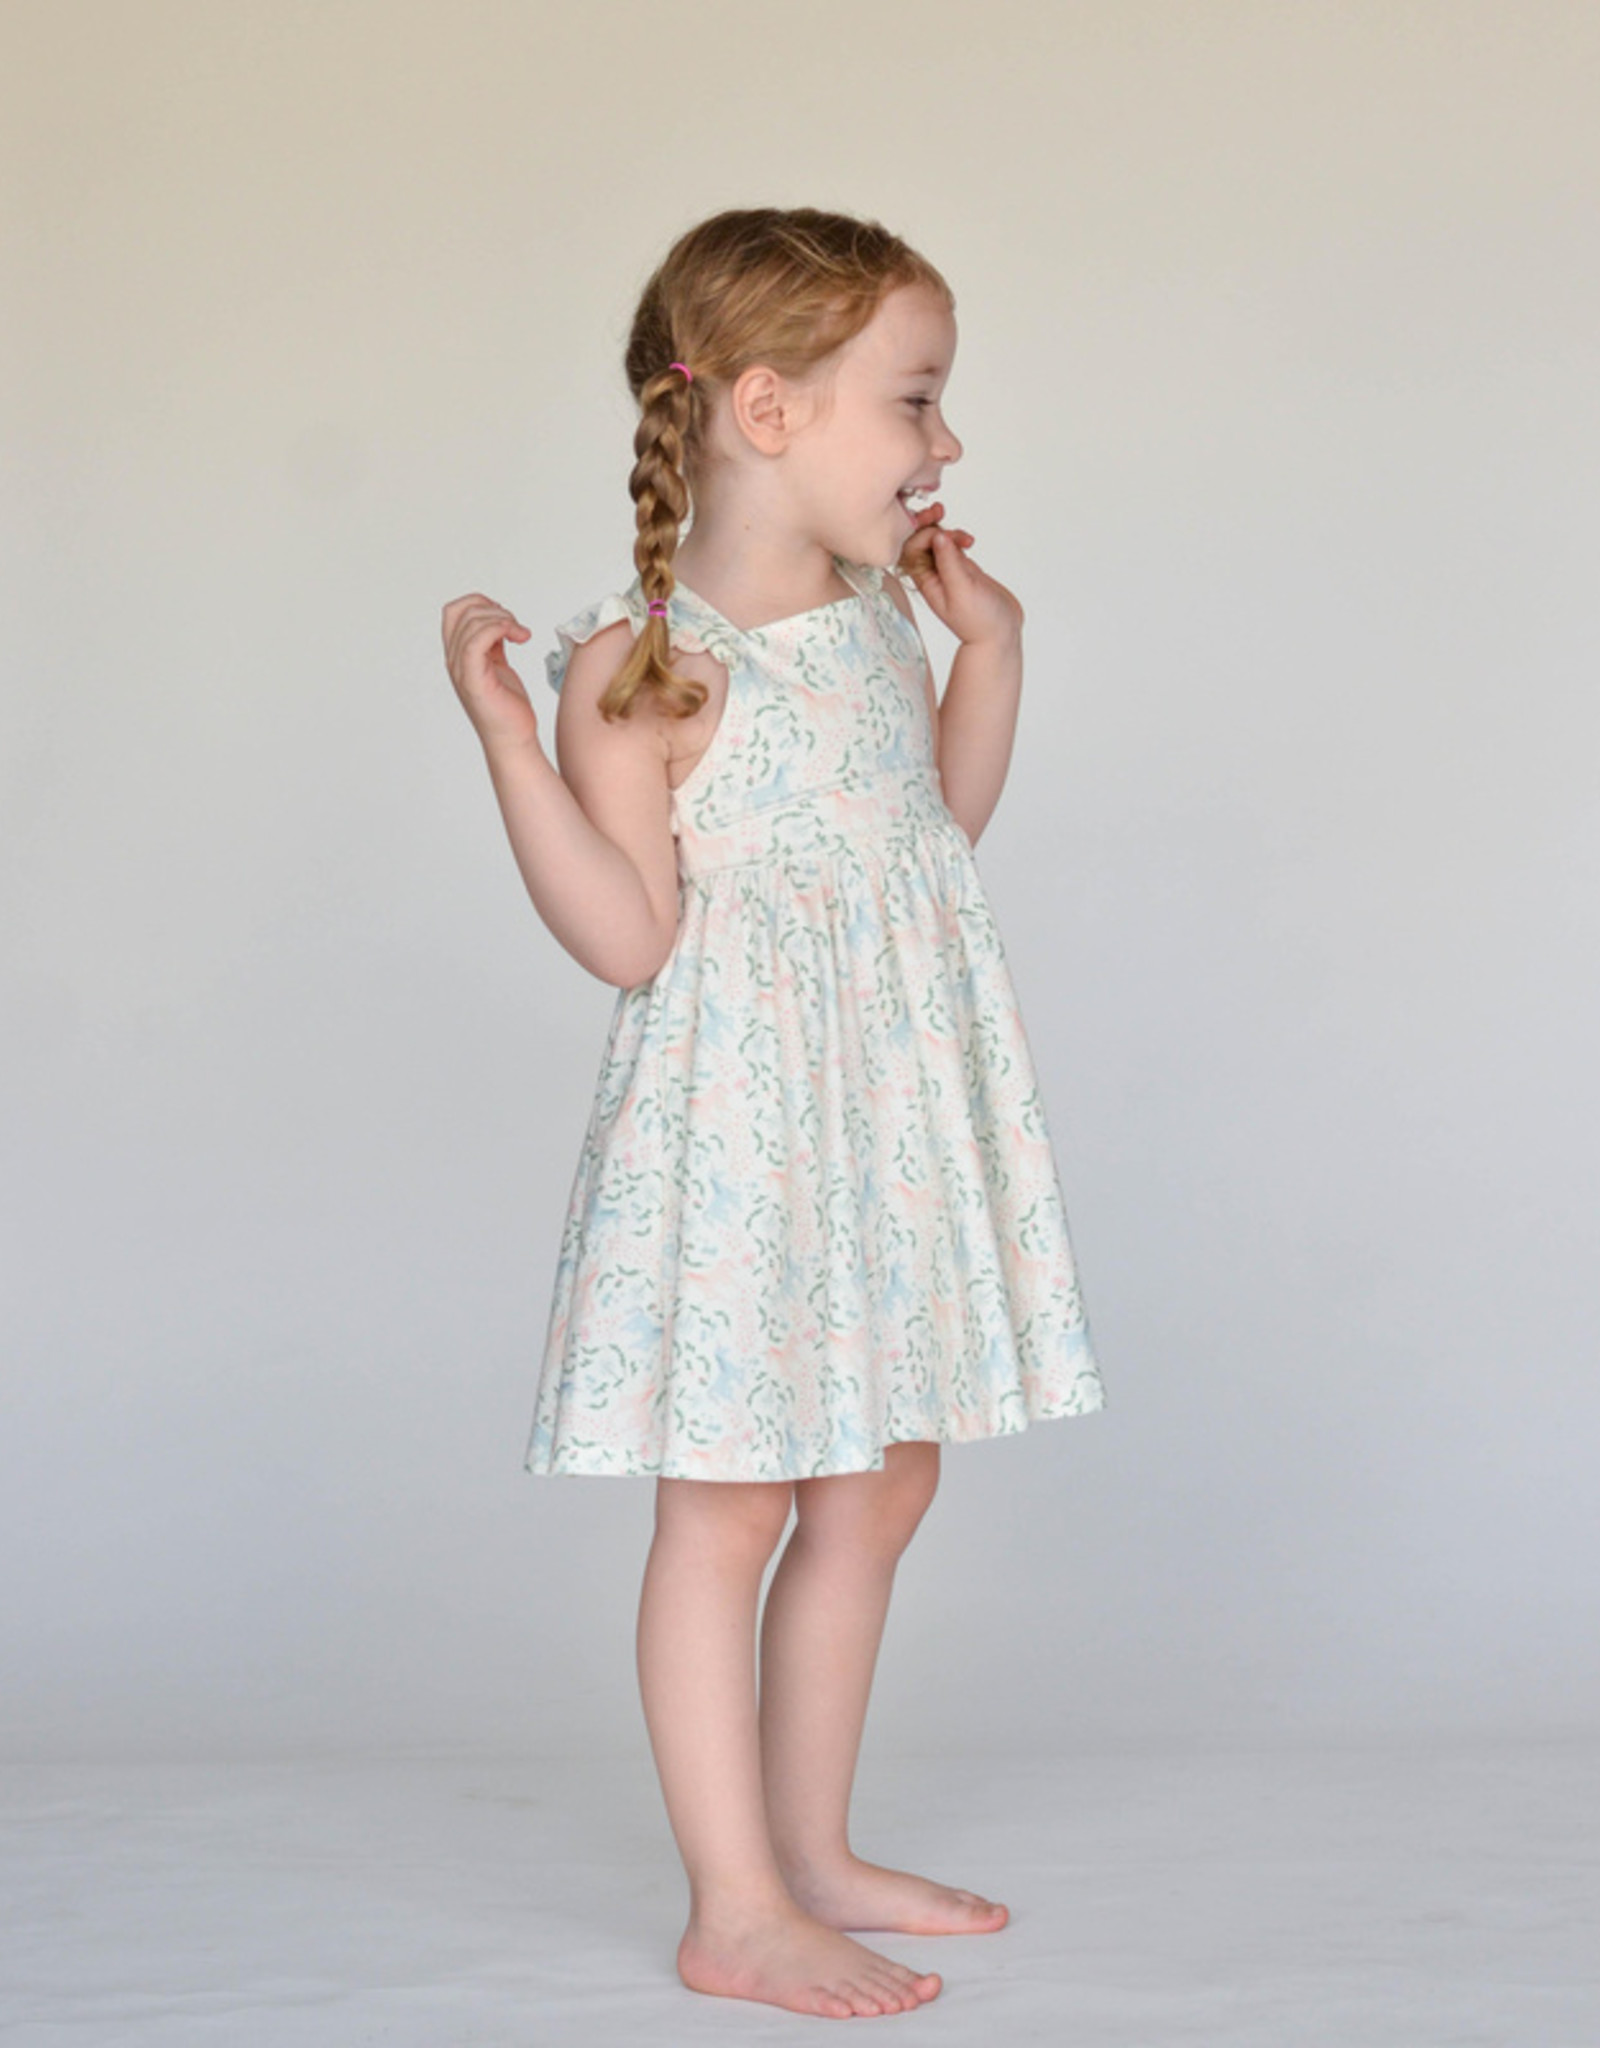 ollie jay Magical Unicorn Rosita Twirl Dress